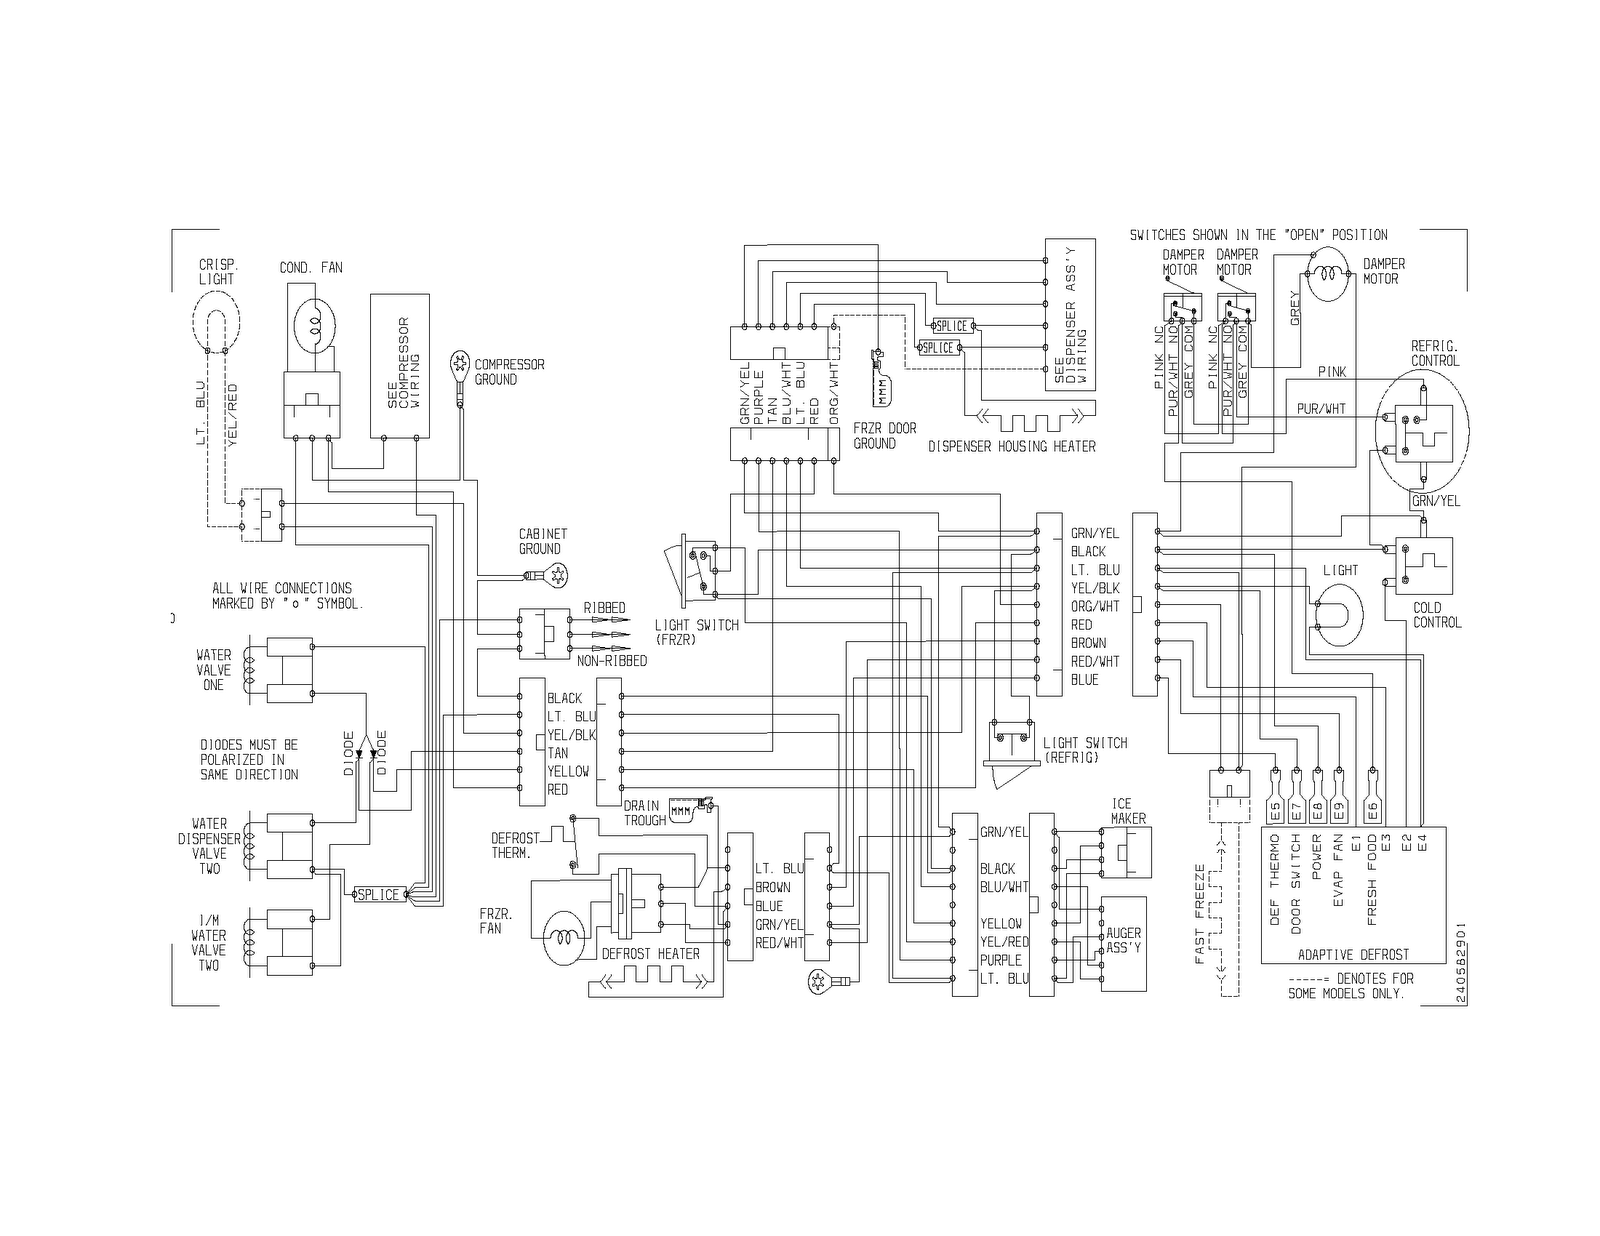 youtube whirlpool ice maker wiring diagram best wiring librarywhirlpool ice maker parts diagram solenoid whirlpool ice [ 1600 x 1236 Pixel ]